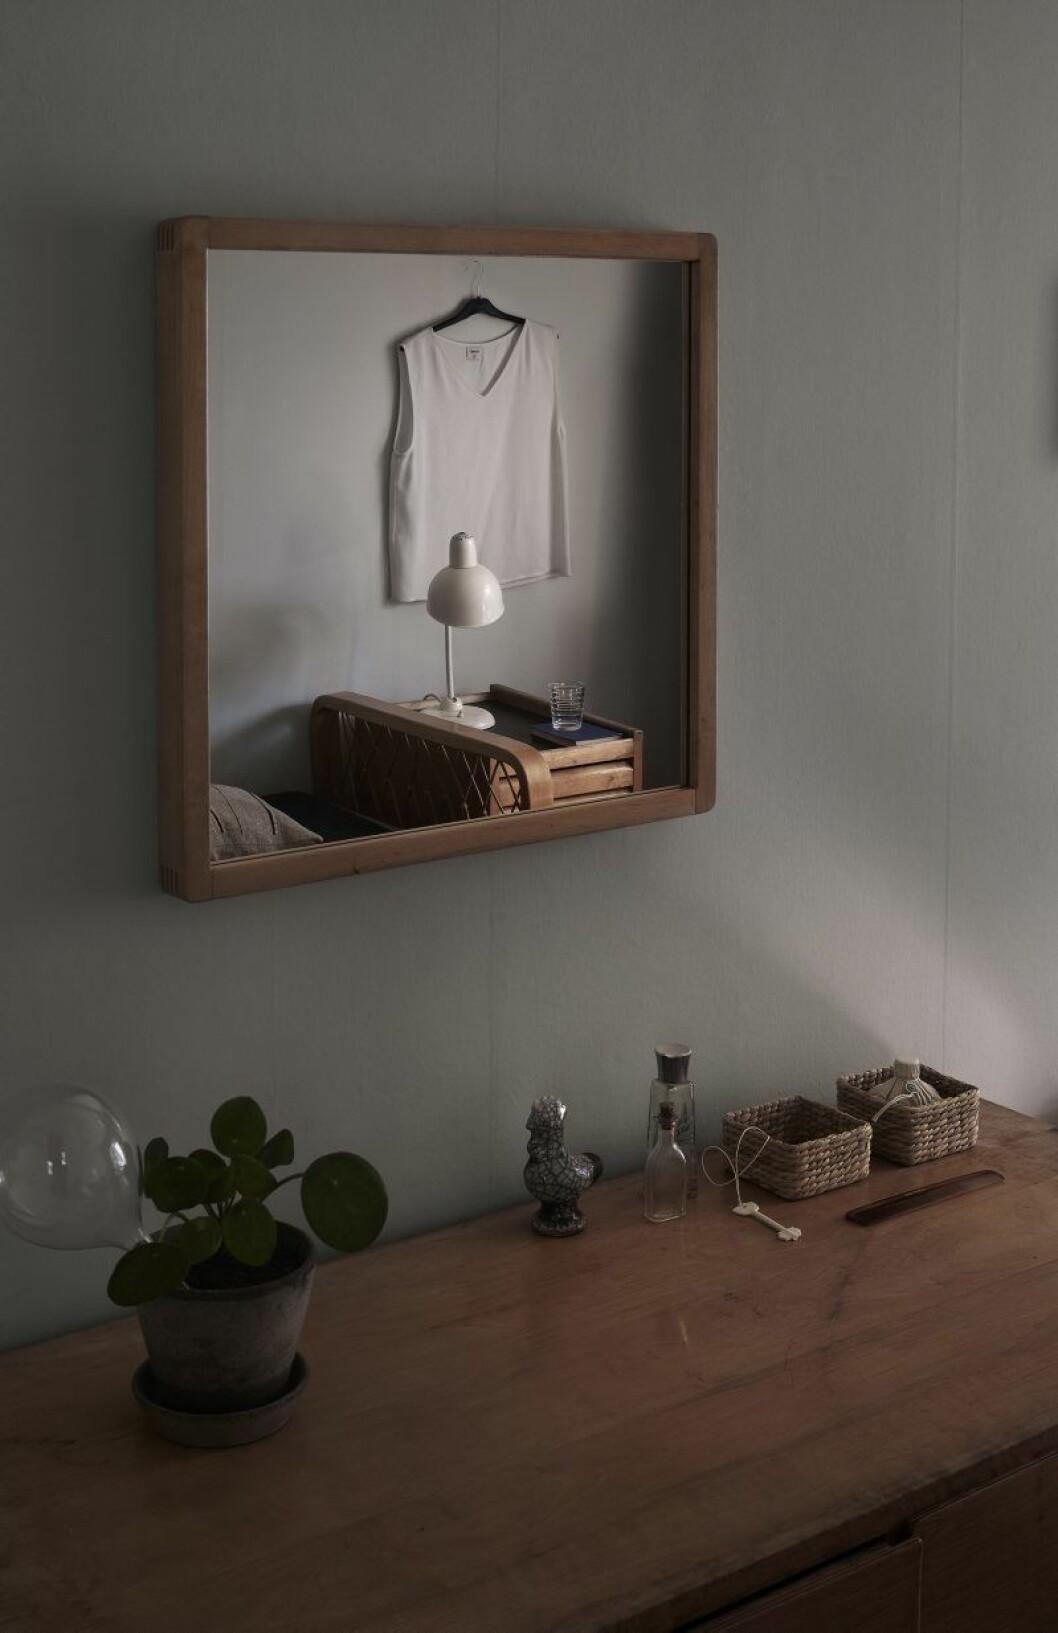 I dotterns sovrum, topp Michele, tupp i keramik, självvattnande glasbubbla, Samuji. Dricksglas av Aino Aalto. Nyckel i keramik, Veera Kulju, Lokal Helsinki.